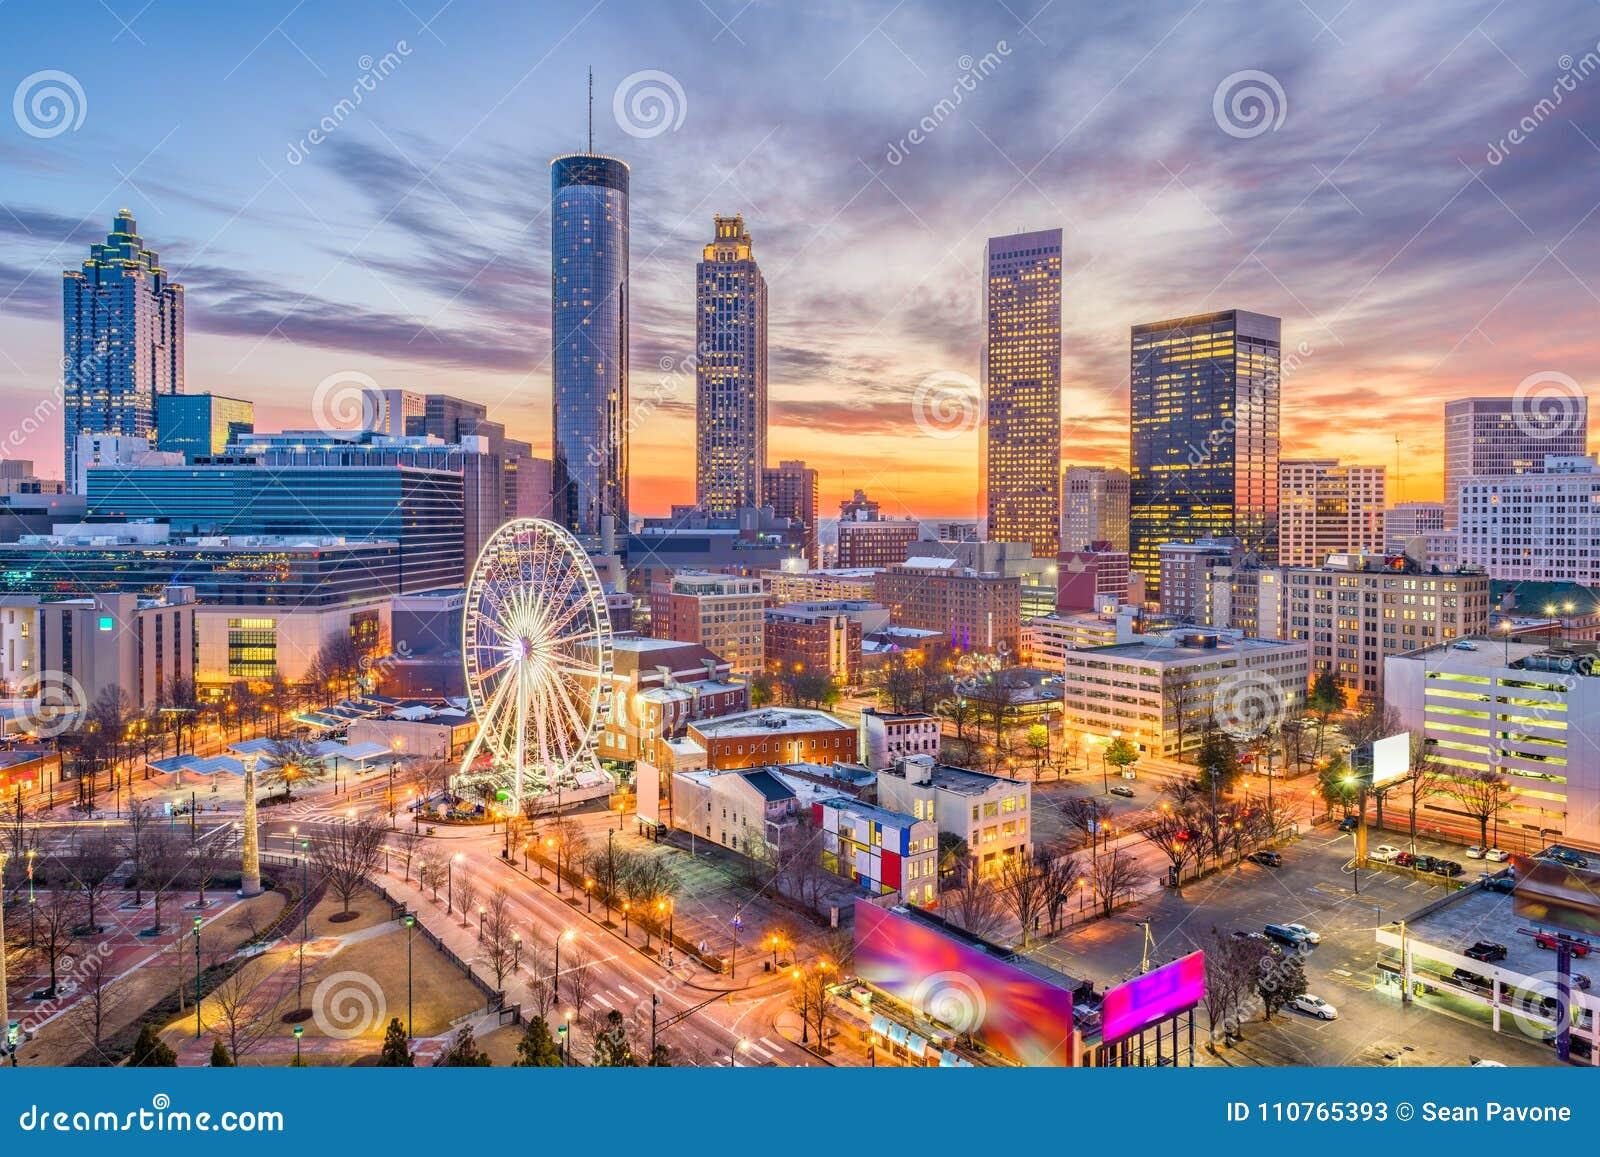 Download Atlanta, Georgia, USA stock image. Image of ferris, cityscape - 110765393